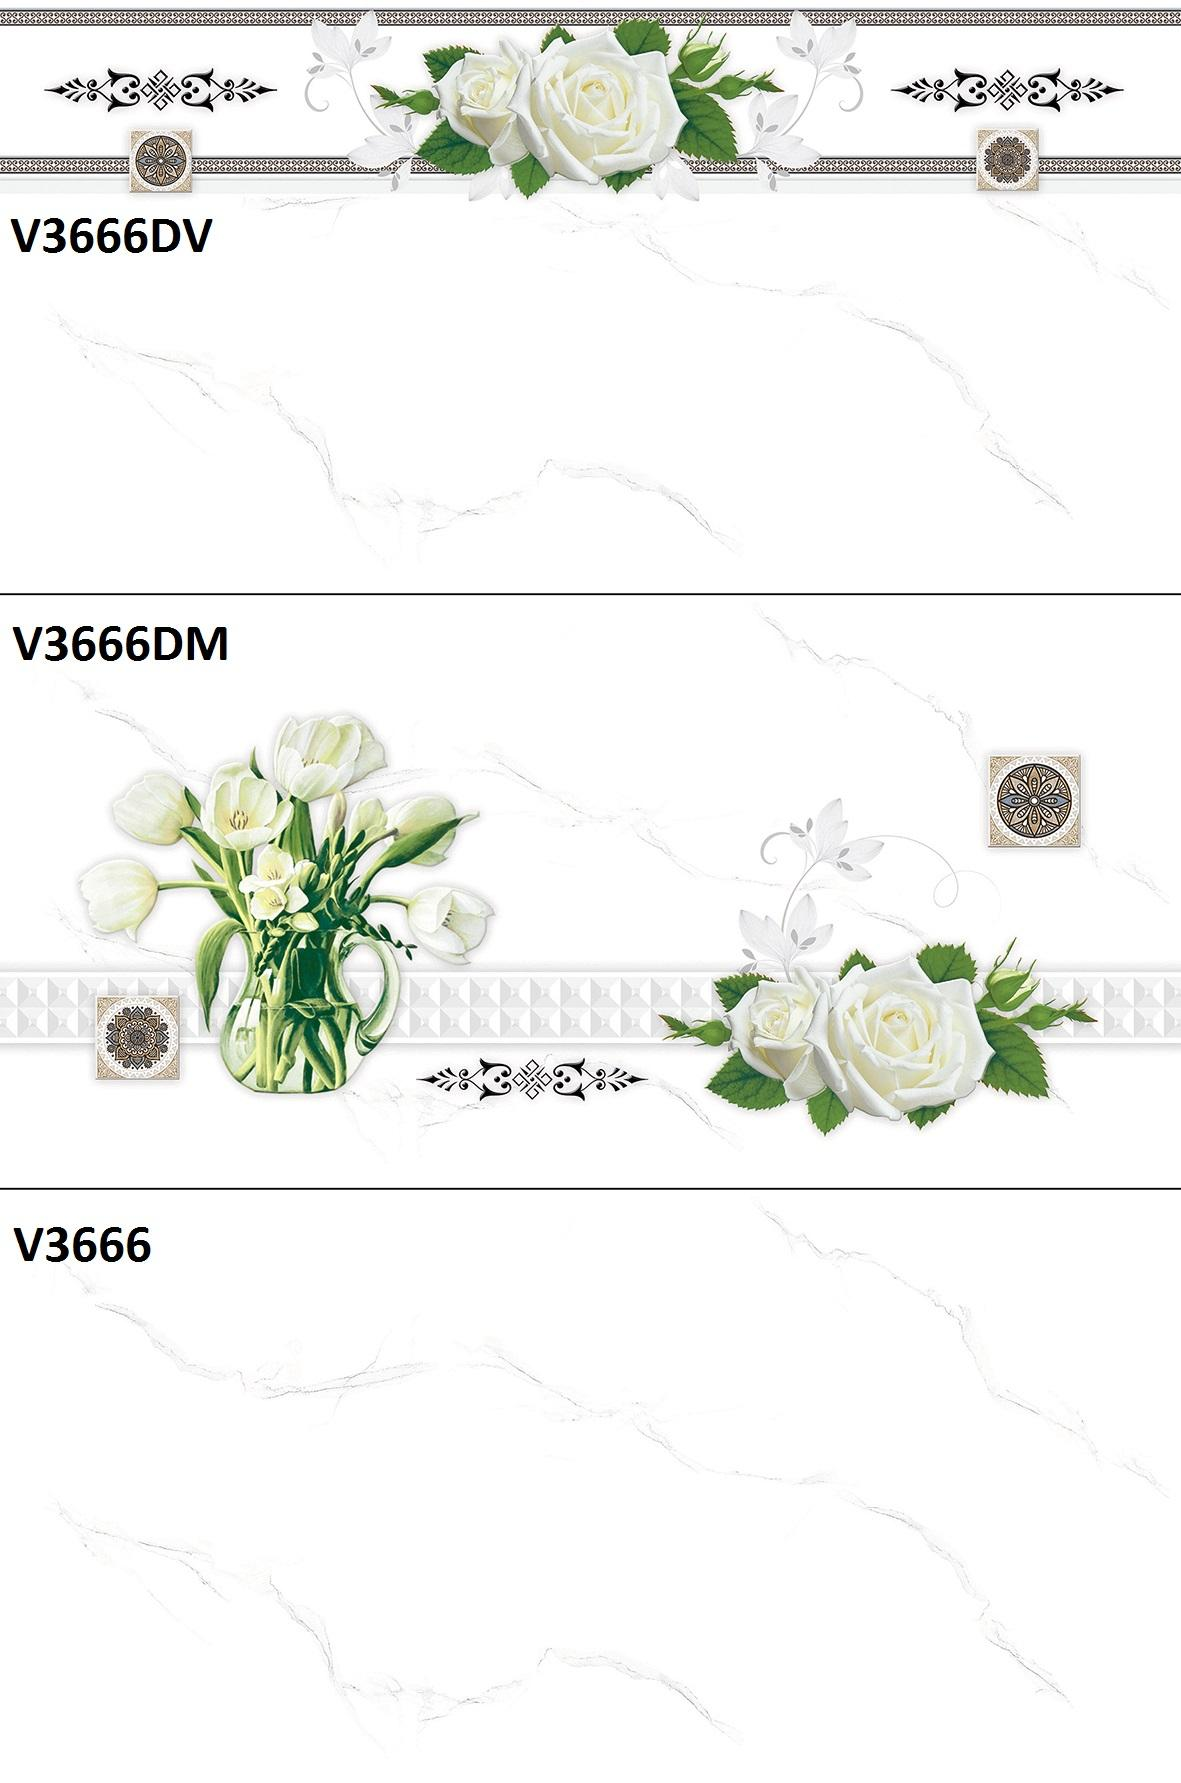 V3666